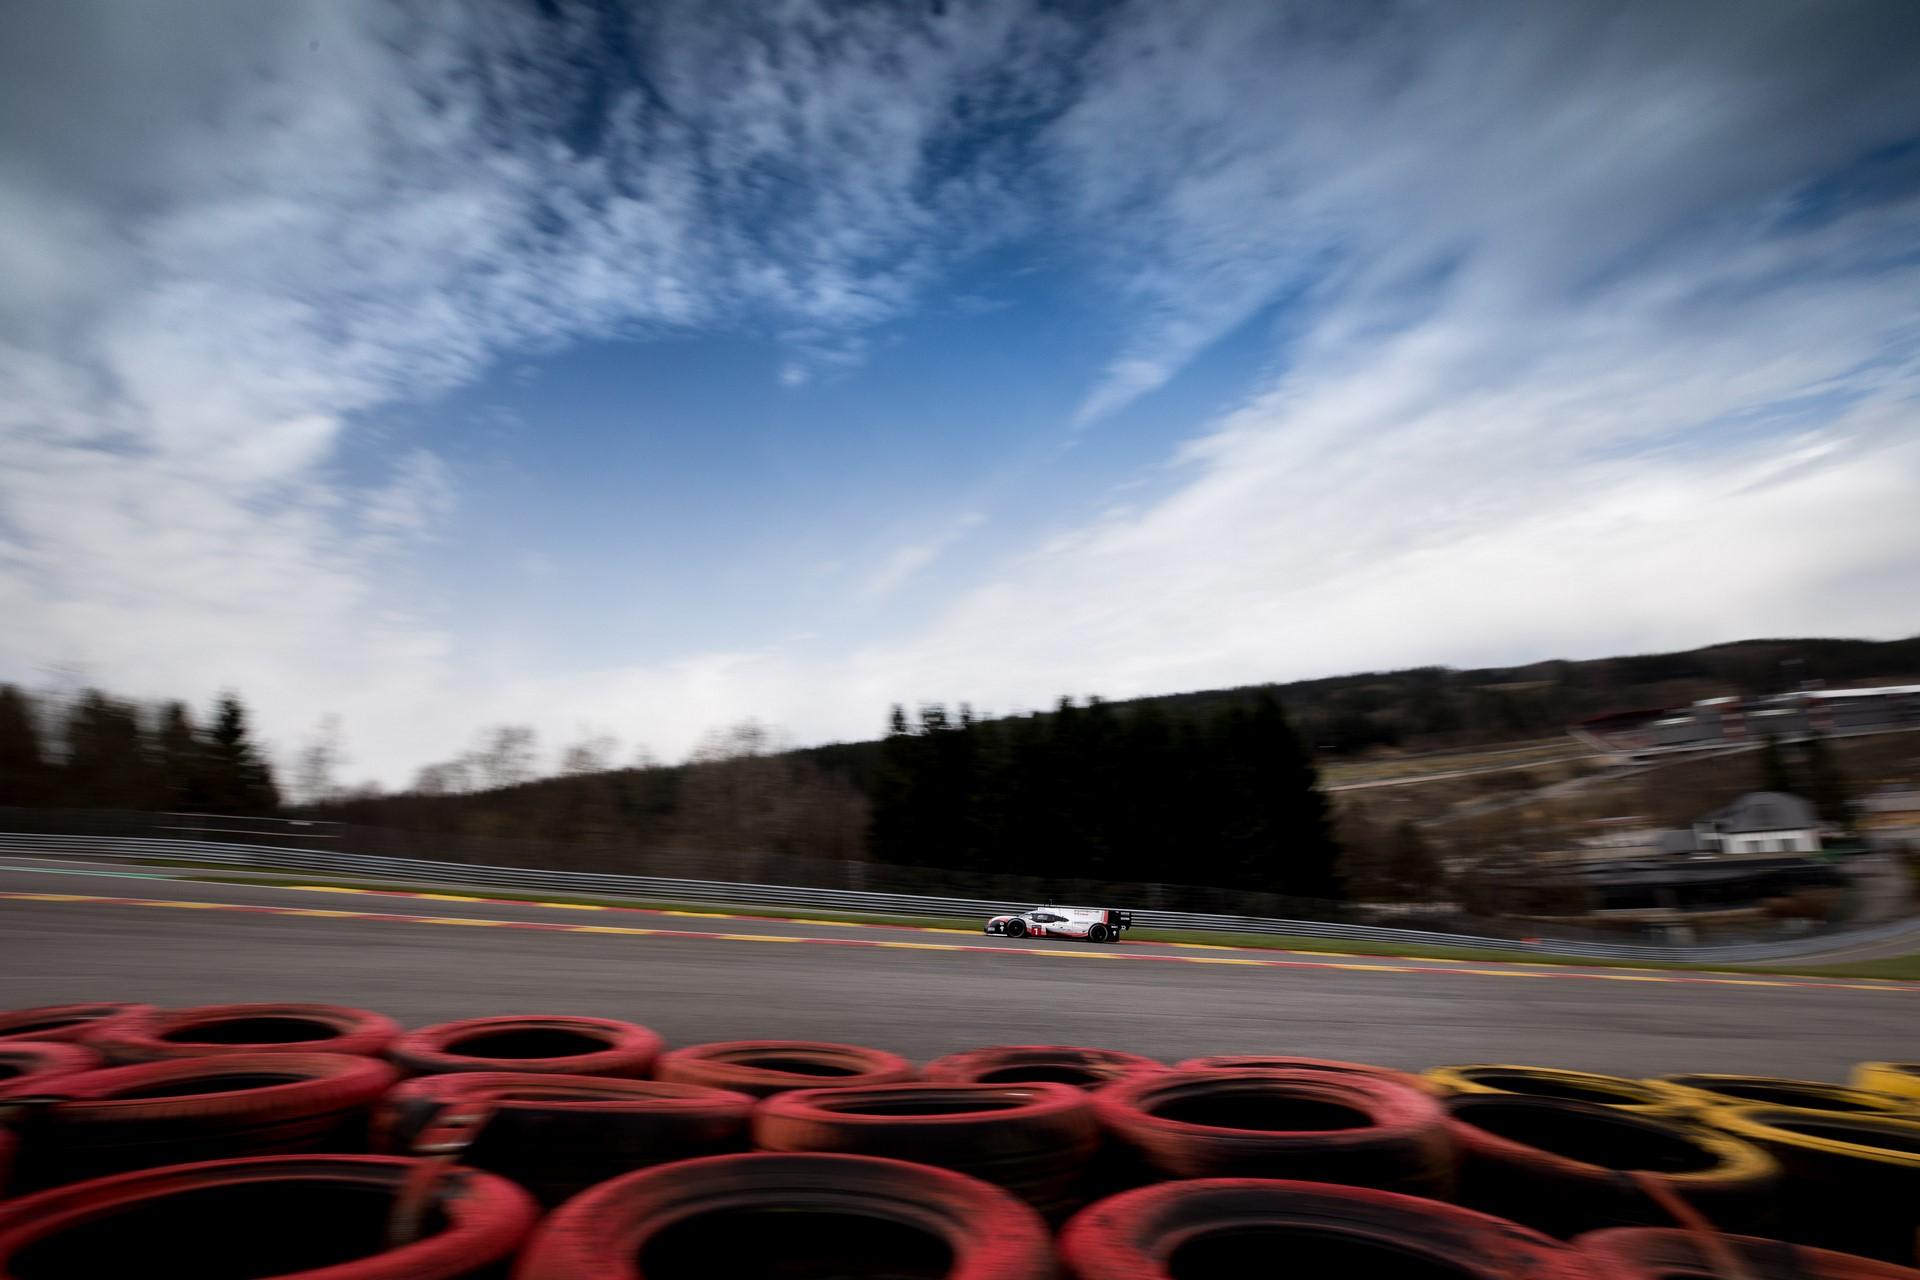 Porsche 919 Hybrid Evo Spa Record (7)